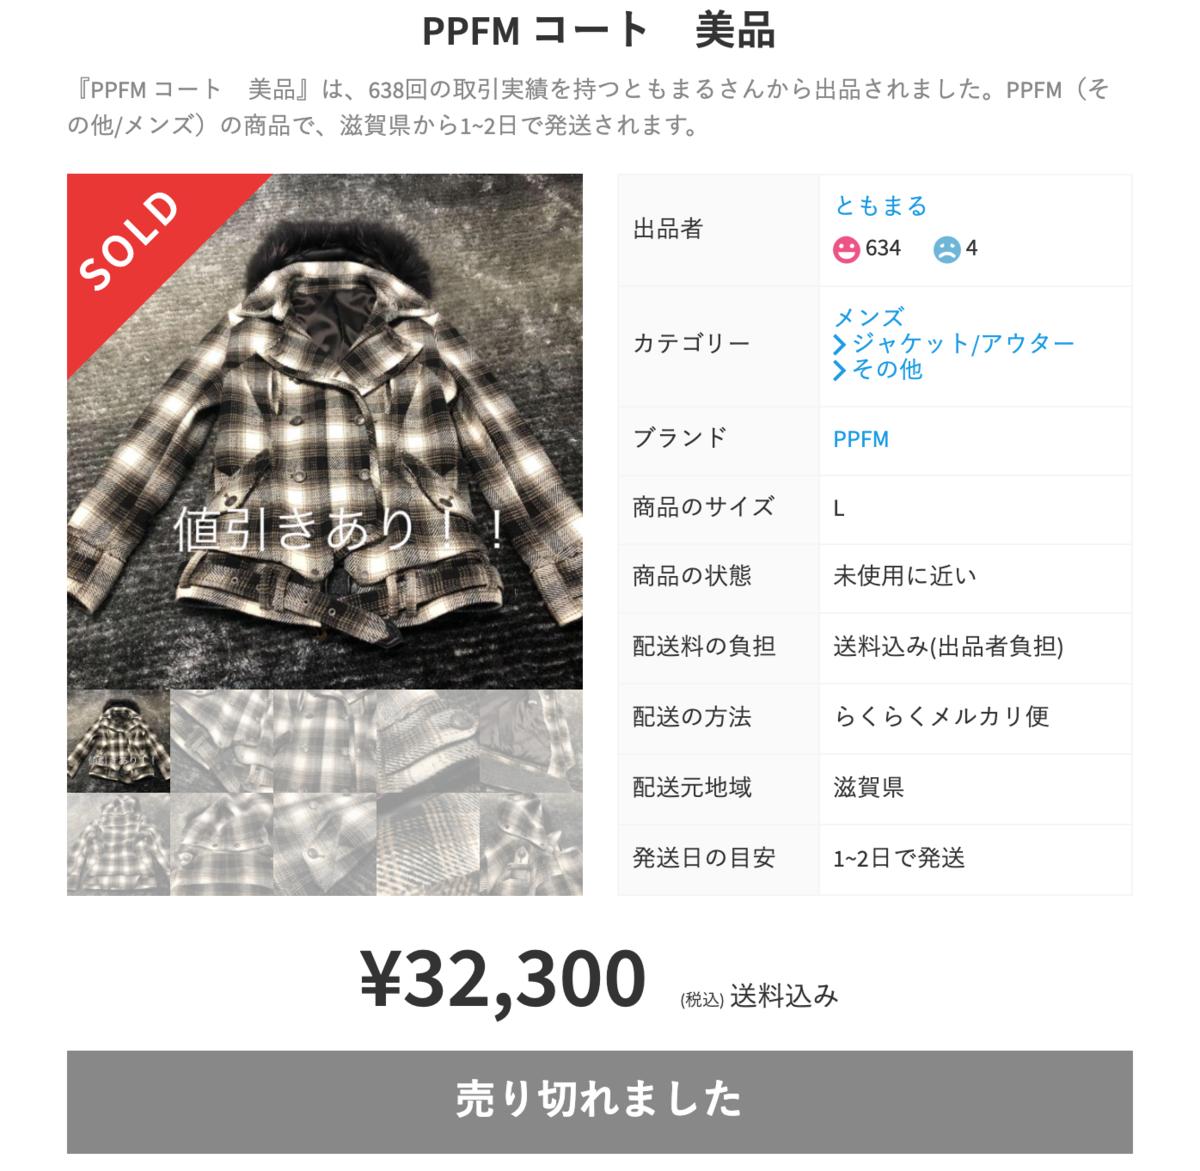 f:id:yamada0221:20201223131107p:plain